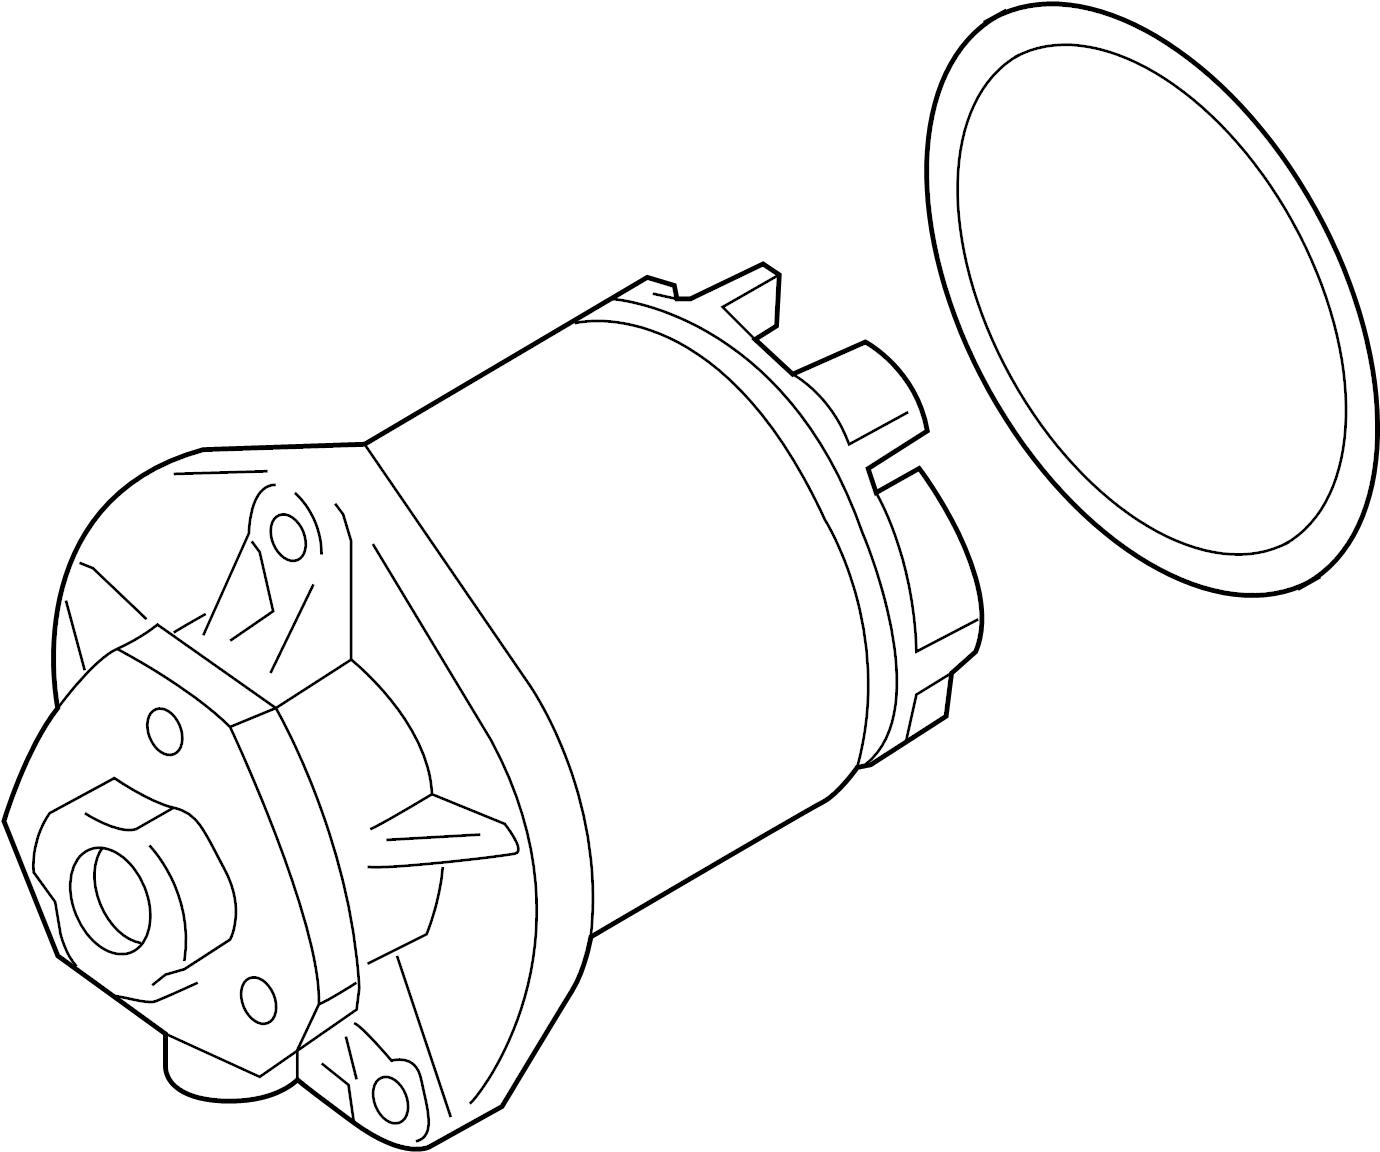 Audi Tt Roadster Water Pump With Adhesive Gasket